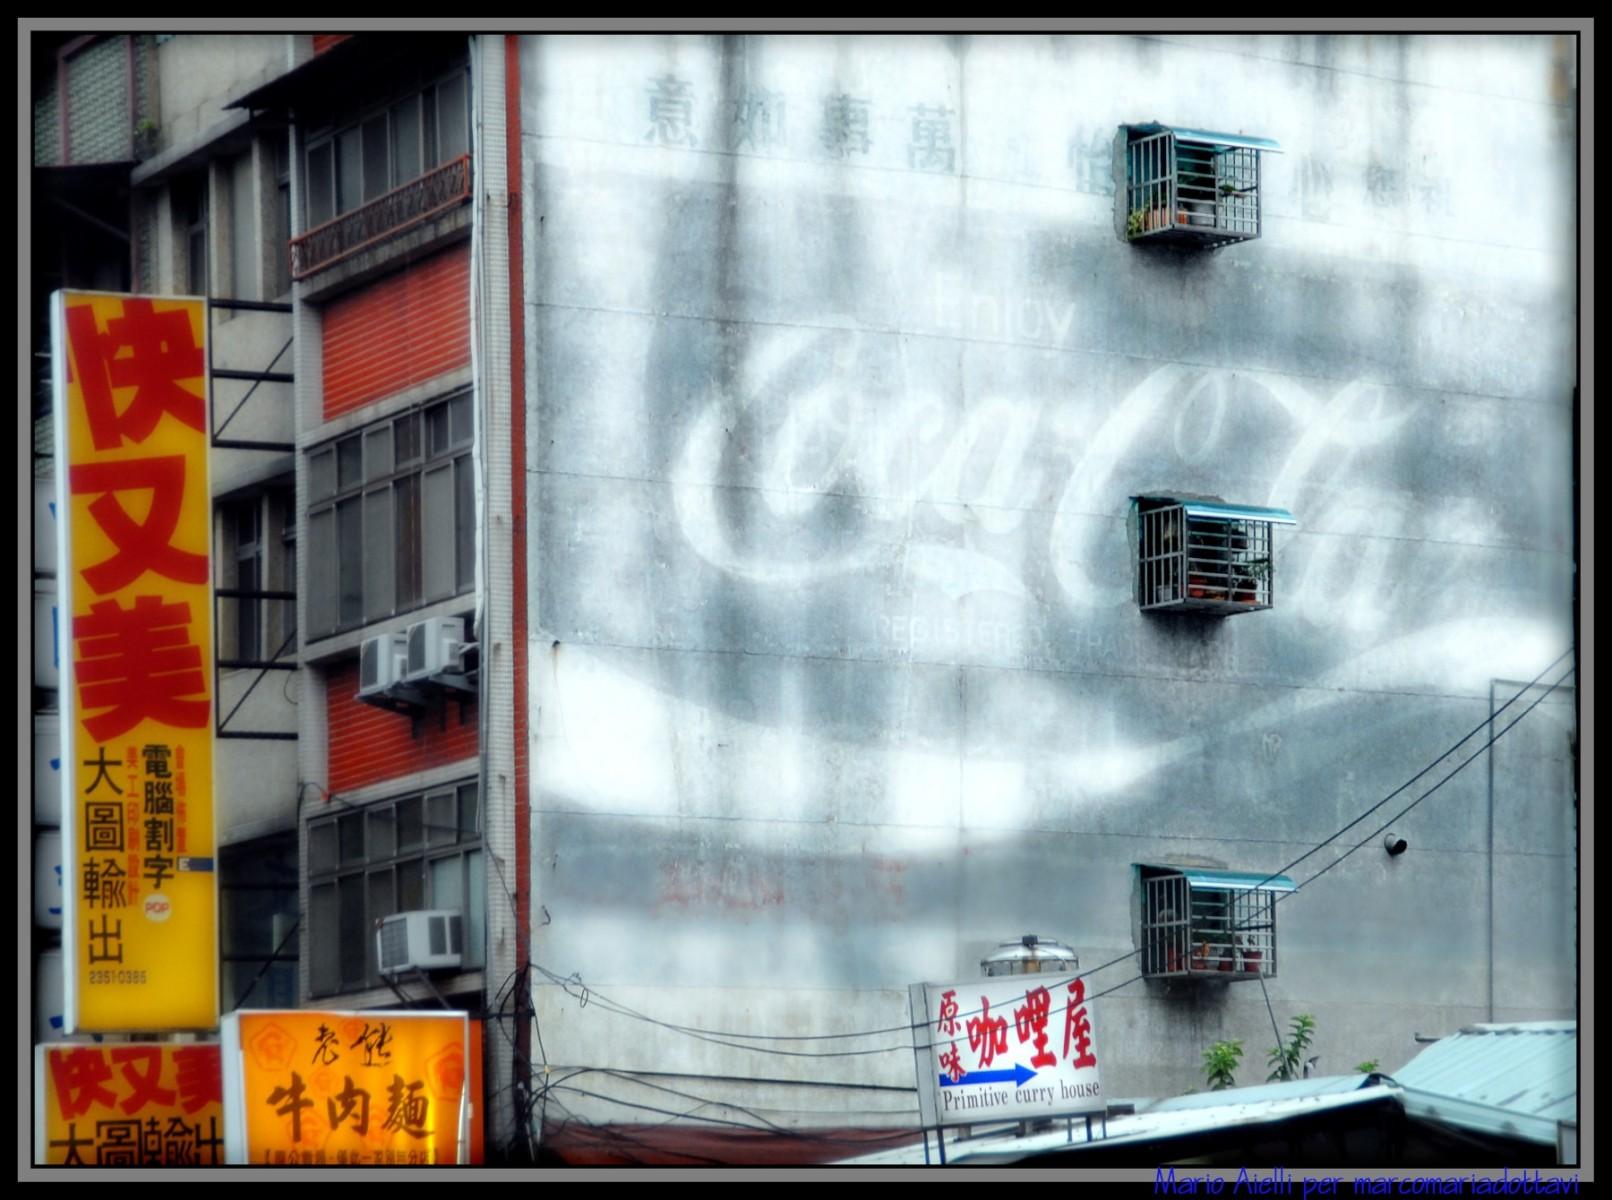 4431608-Taipei-0141-ma Storie di Luce